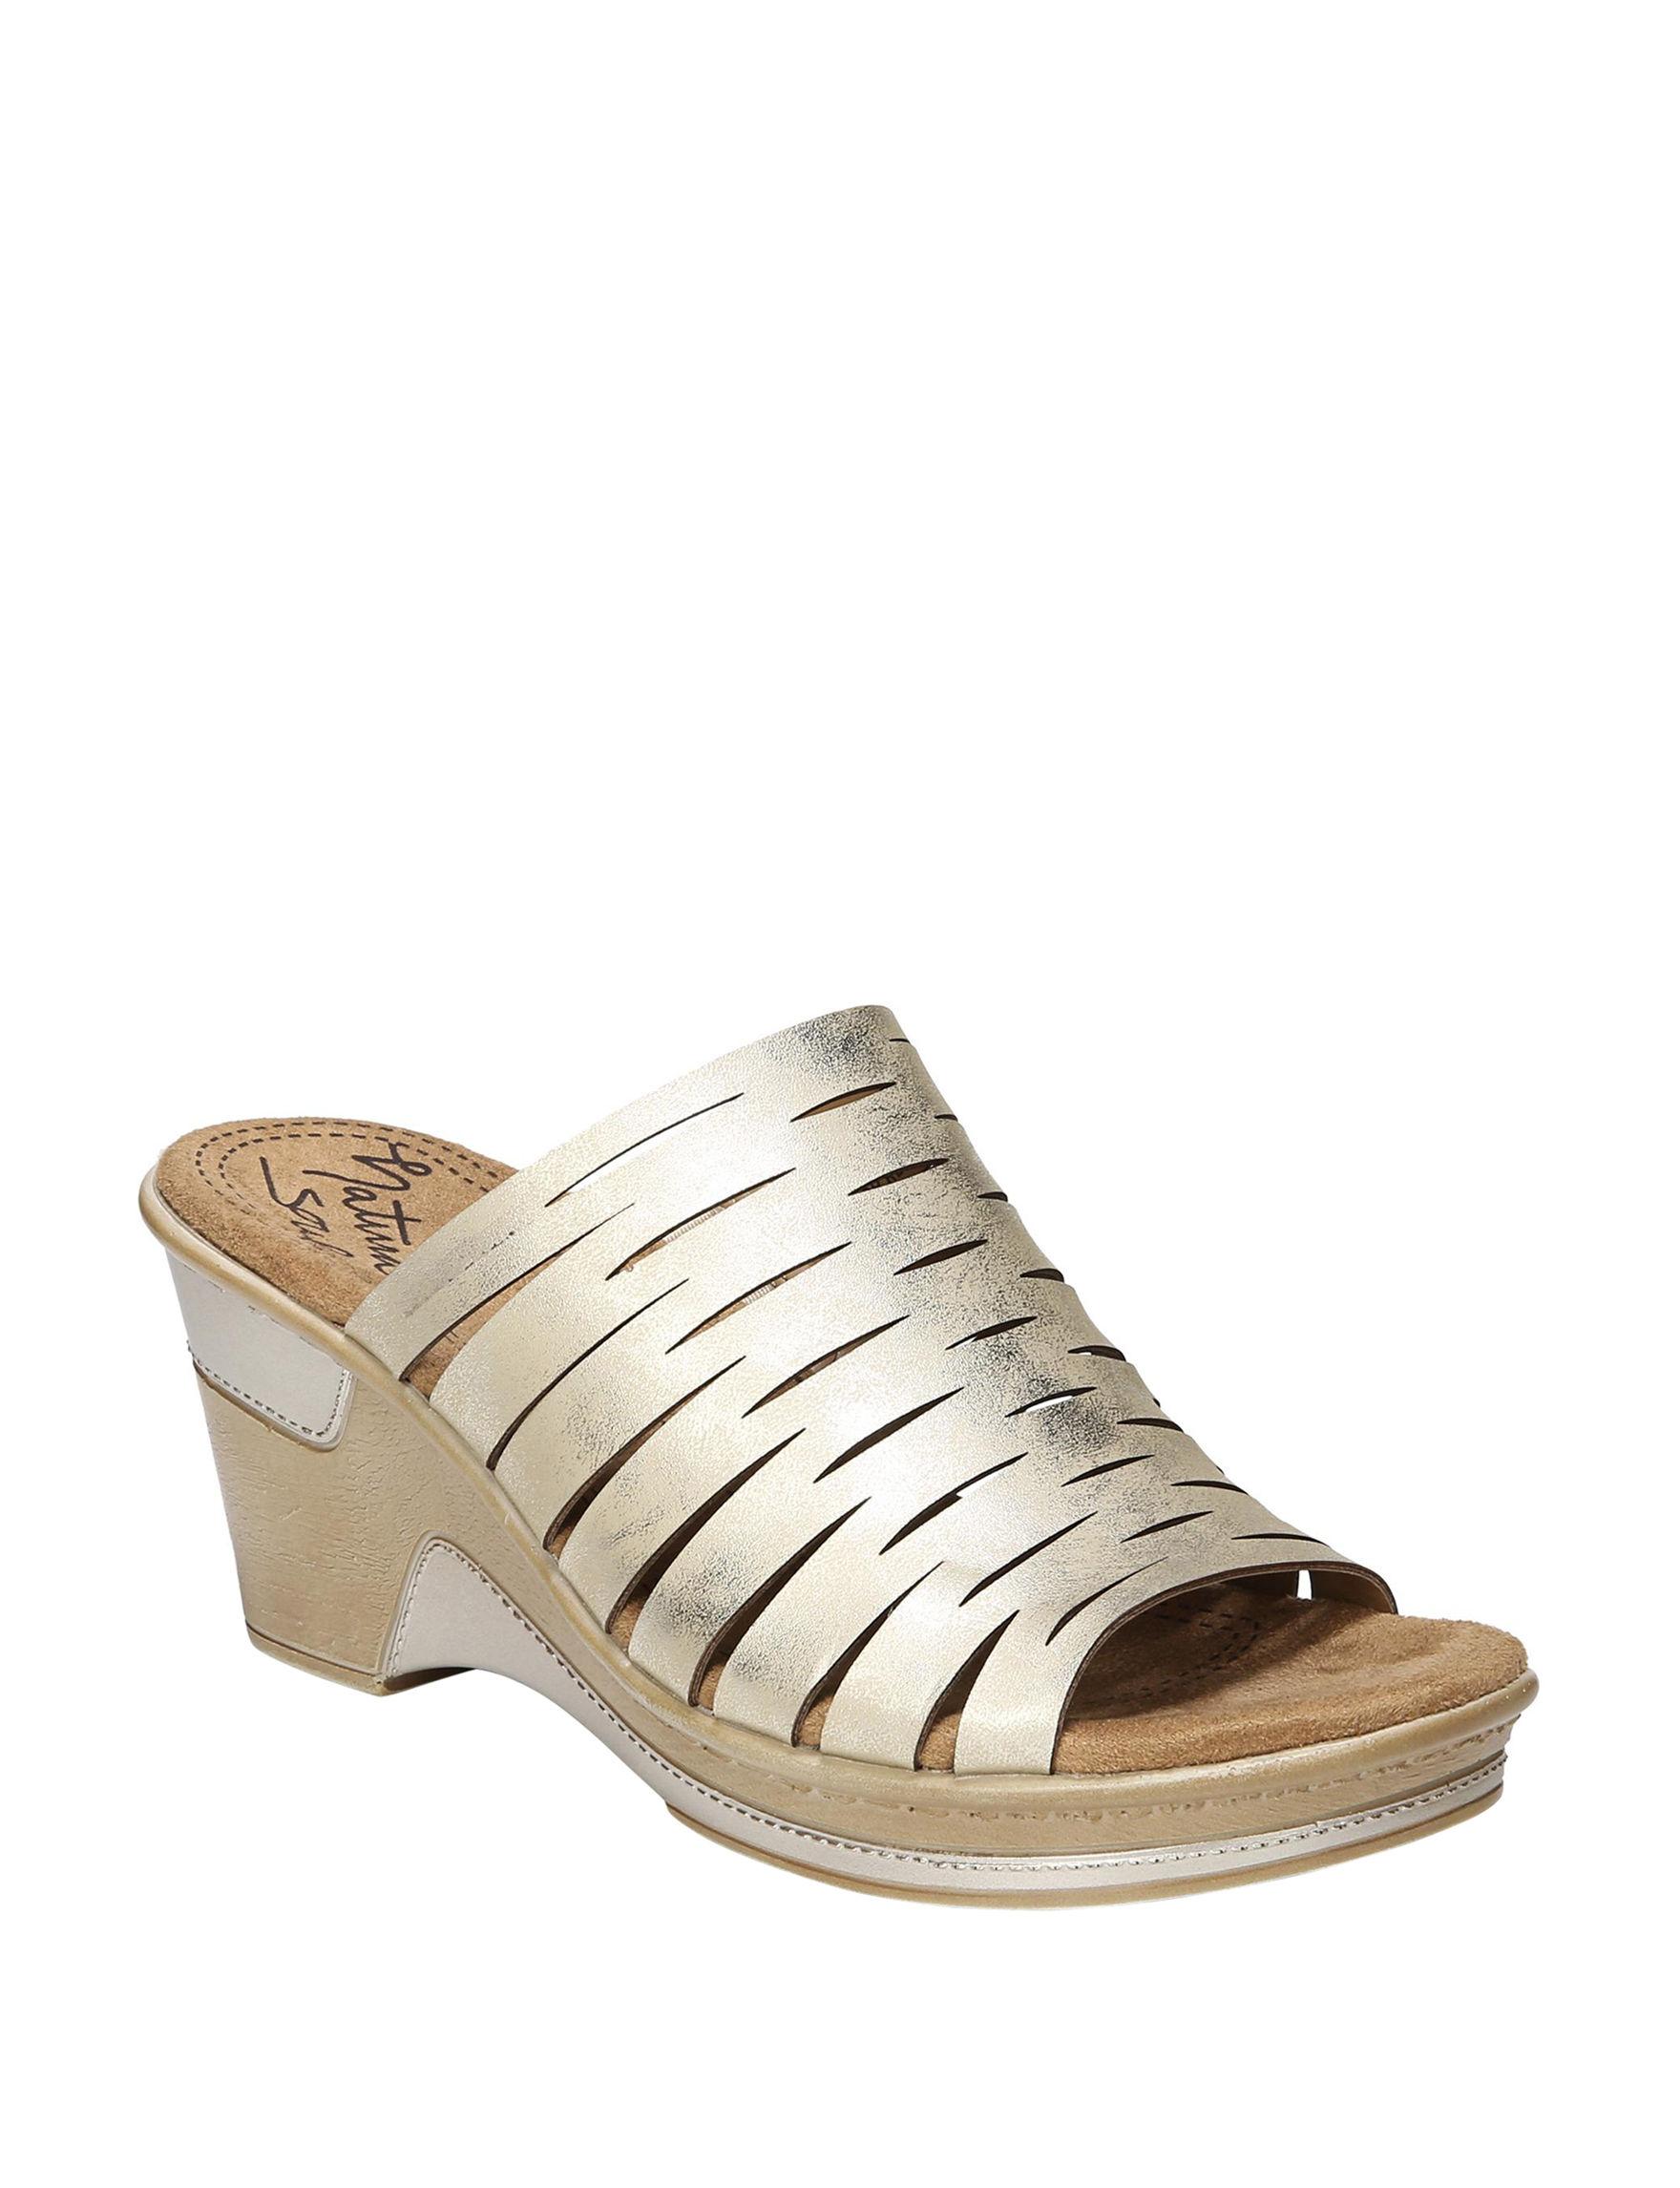 Natural Soul Gold Wedge Sandals